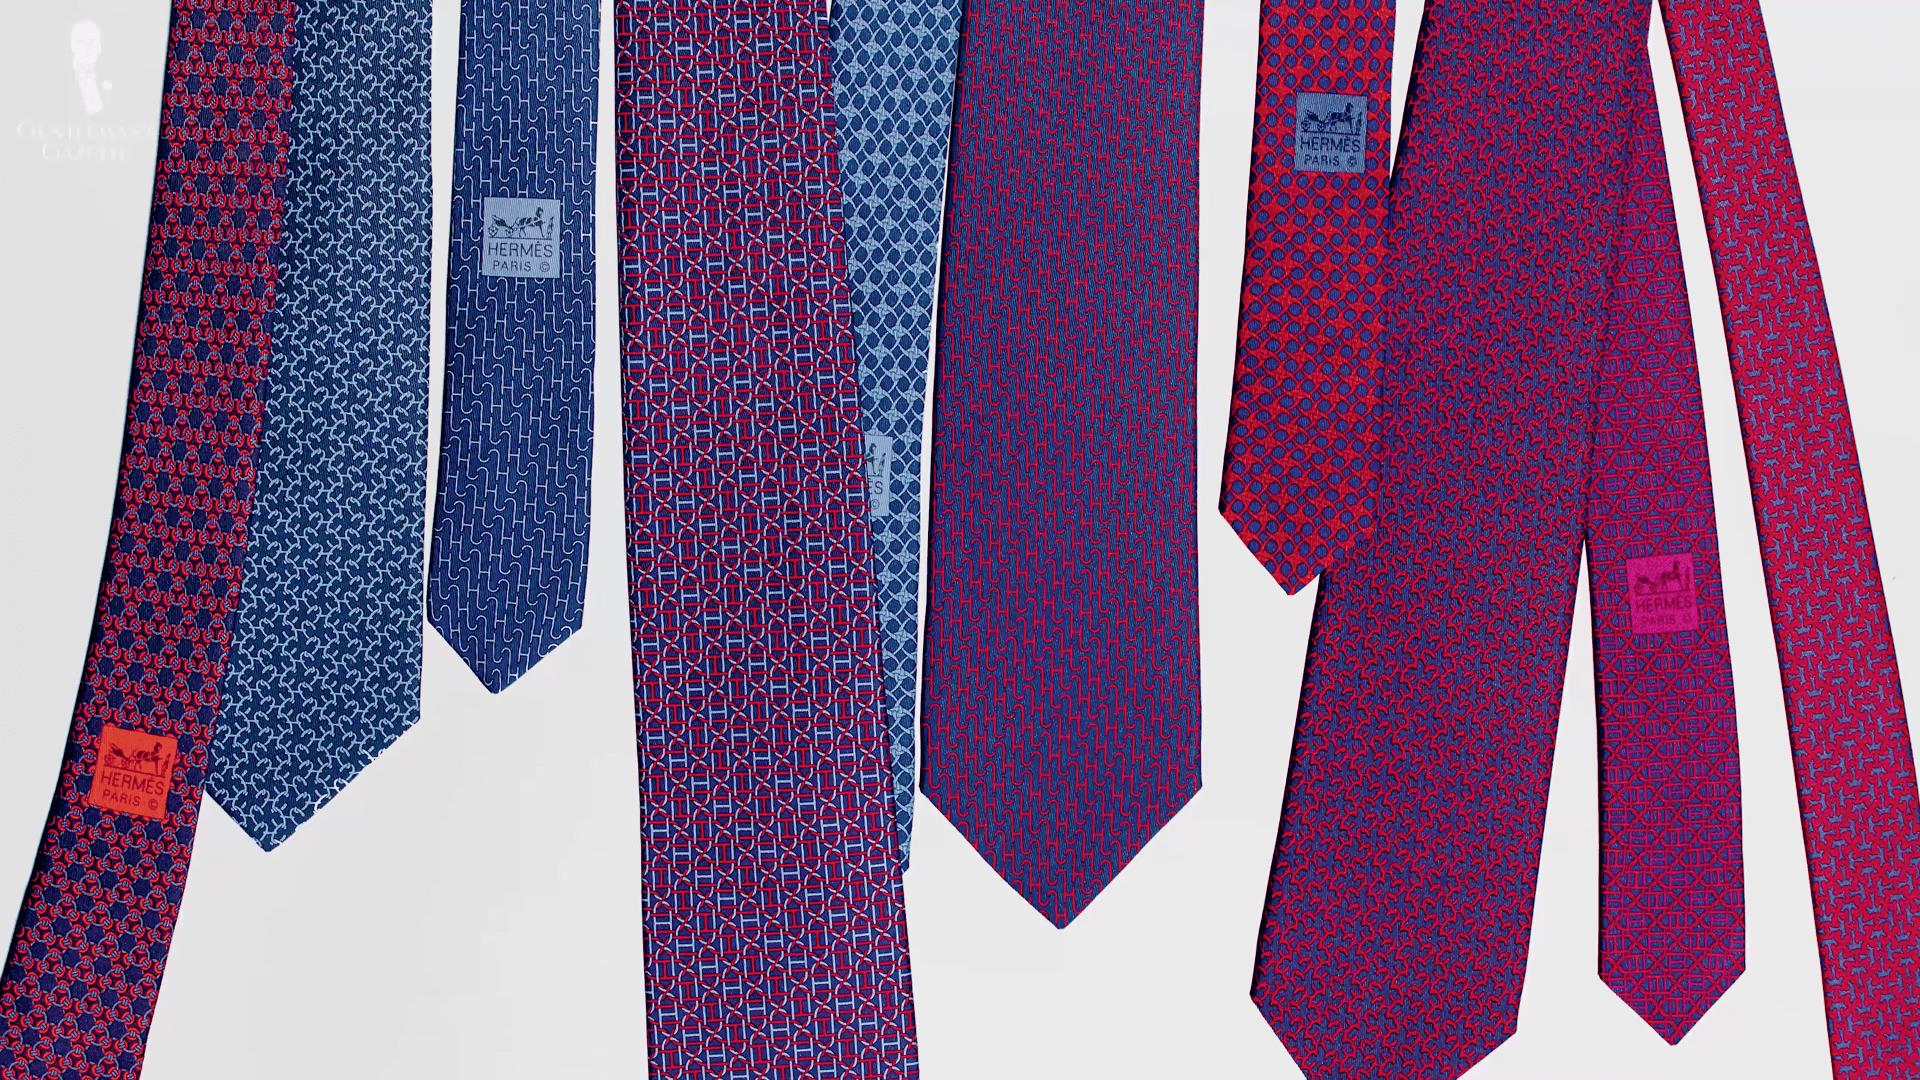 Colorful Goat Head Classic Men Silk Tie Woven Jacquard Neck Ties